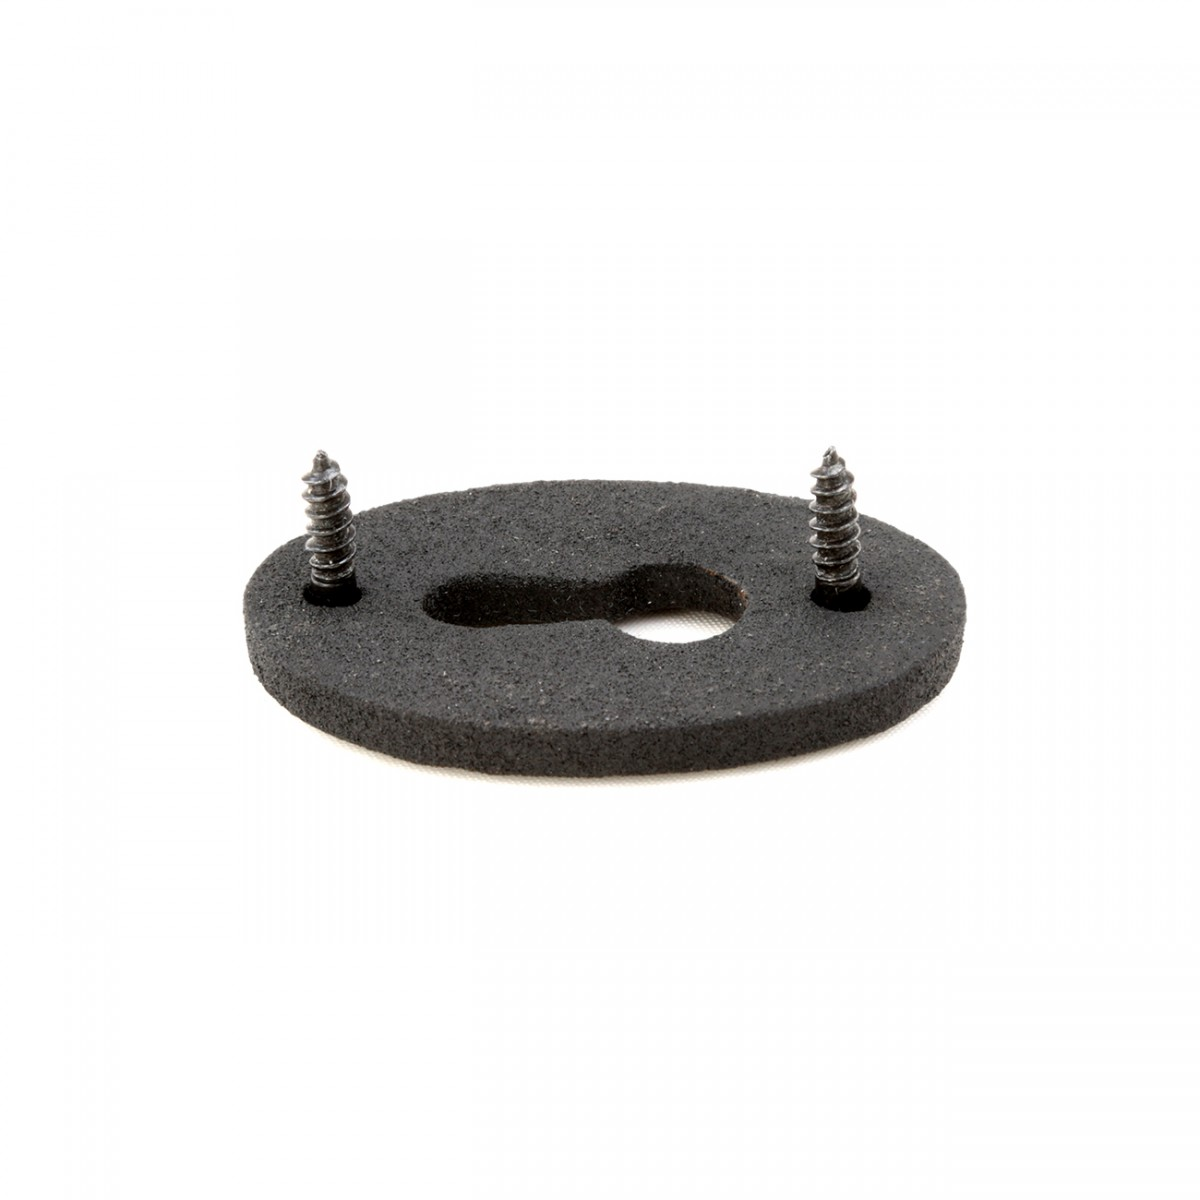 Wrought Iron Keyhole Cover Escutcheon Replacement 134 H Pack of 8 Escutcheons Keyholes Escutcheon